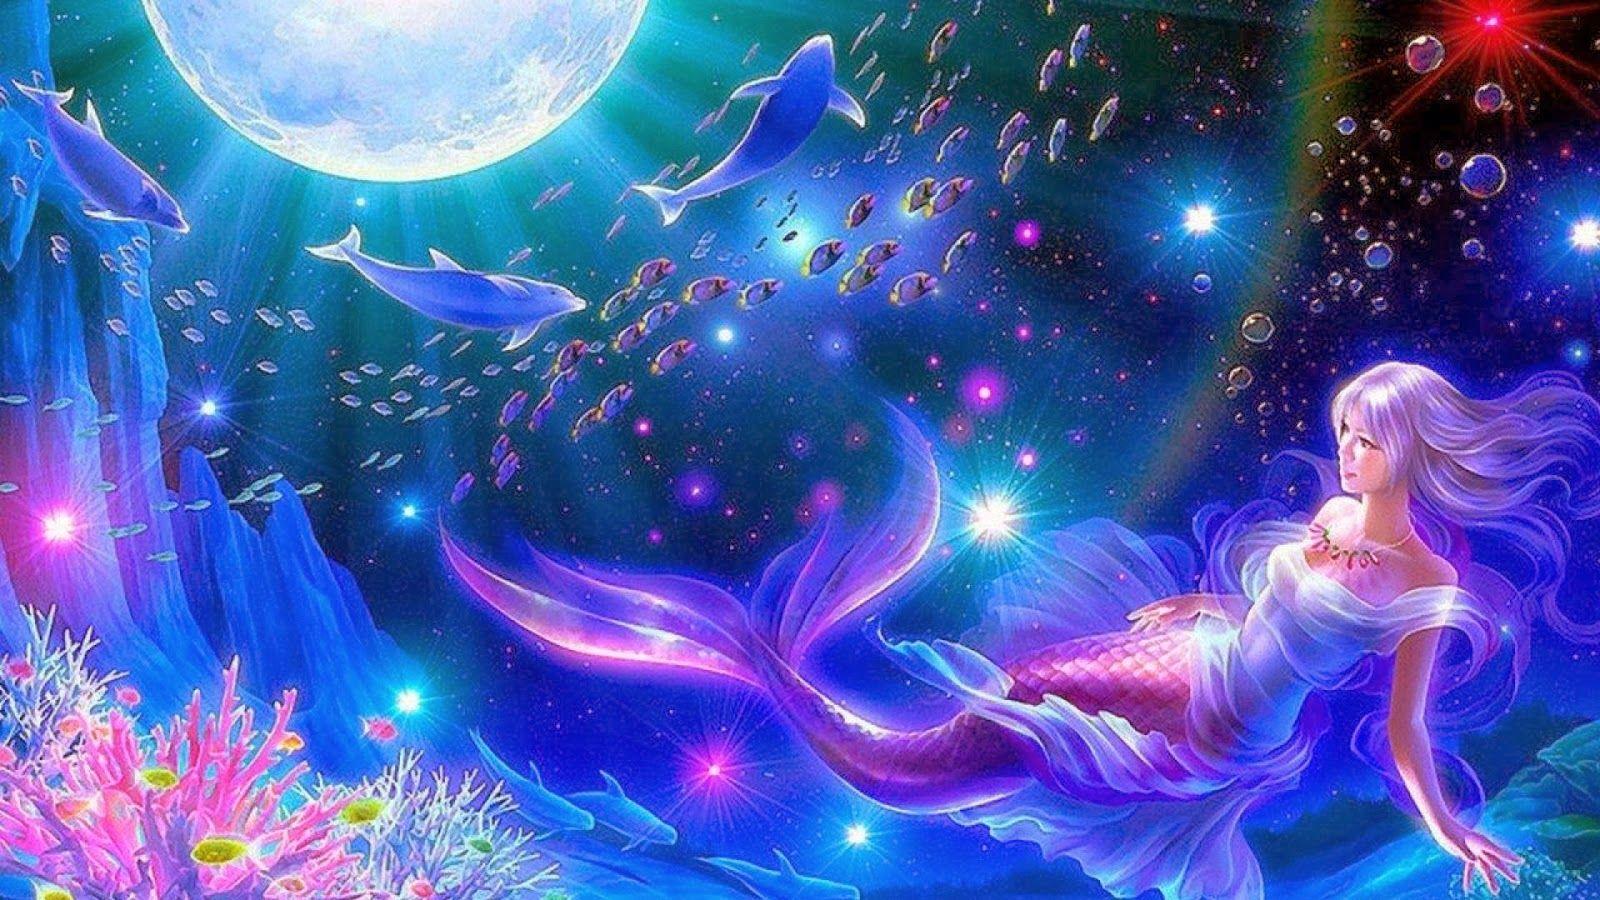 HD Mermaid Wallpaper 1600×1200 Mermaid Wallpaper